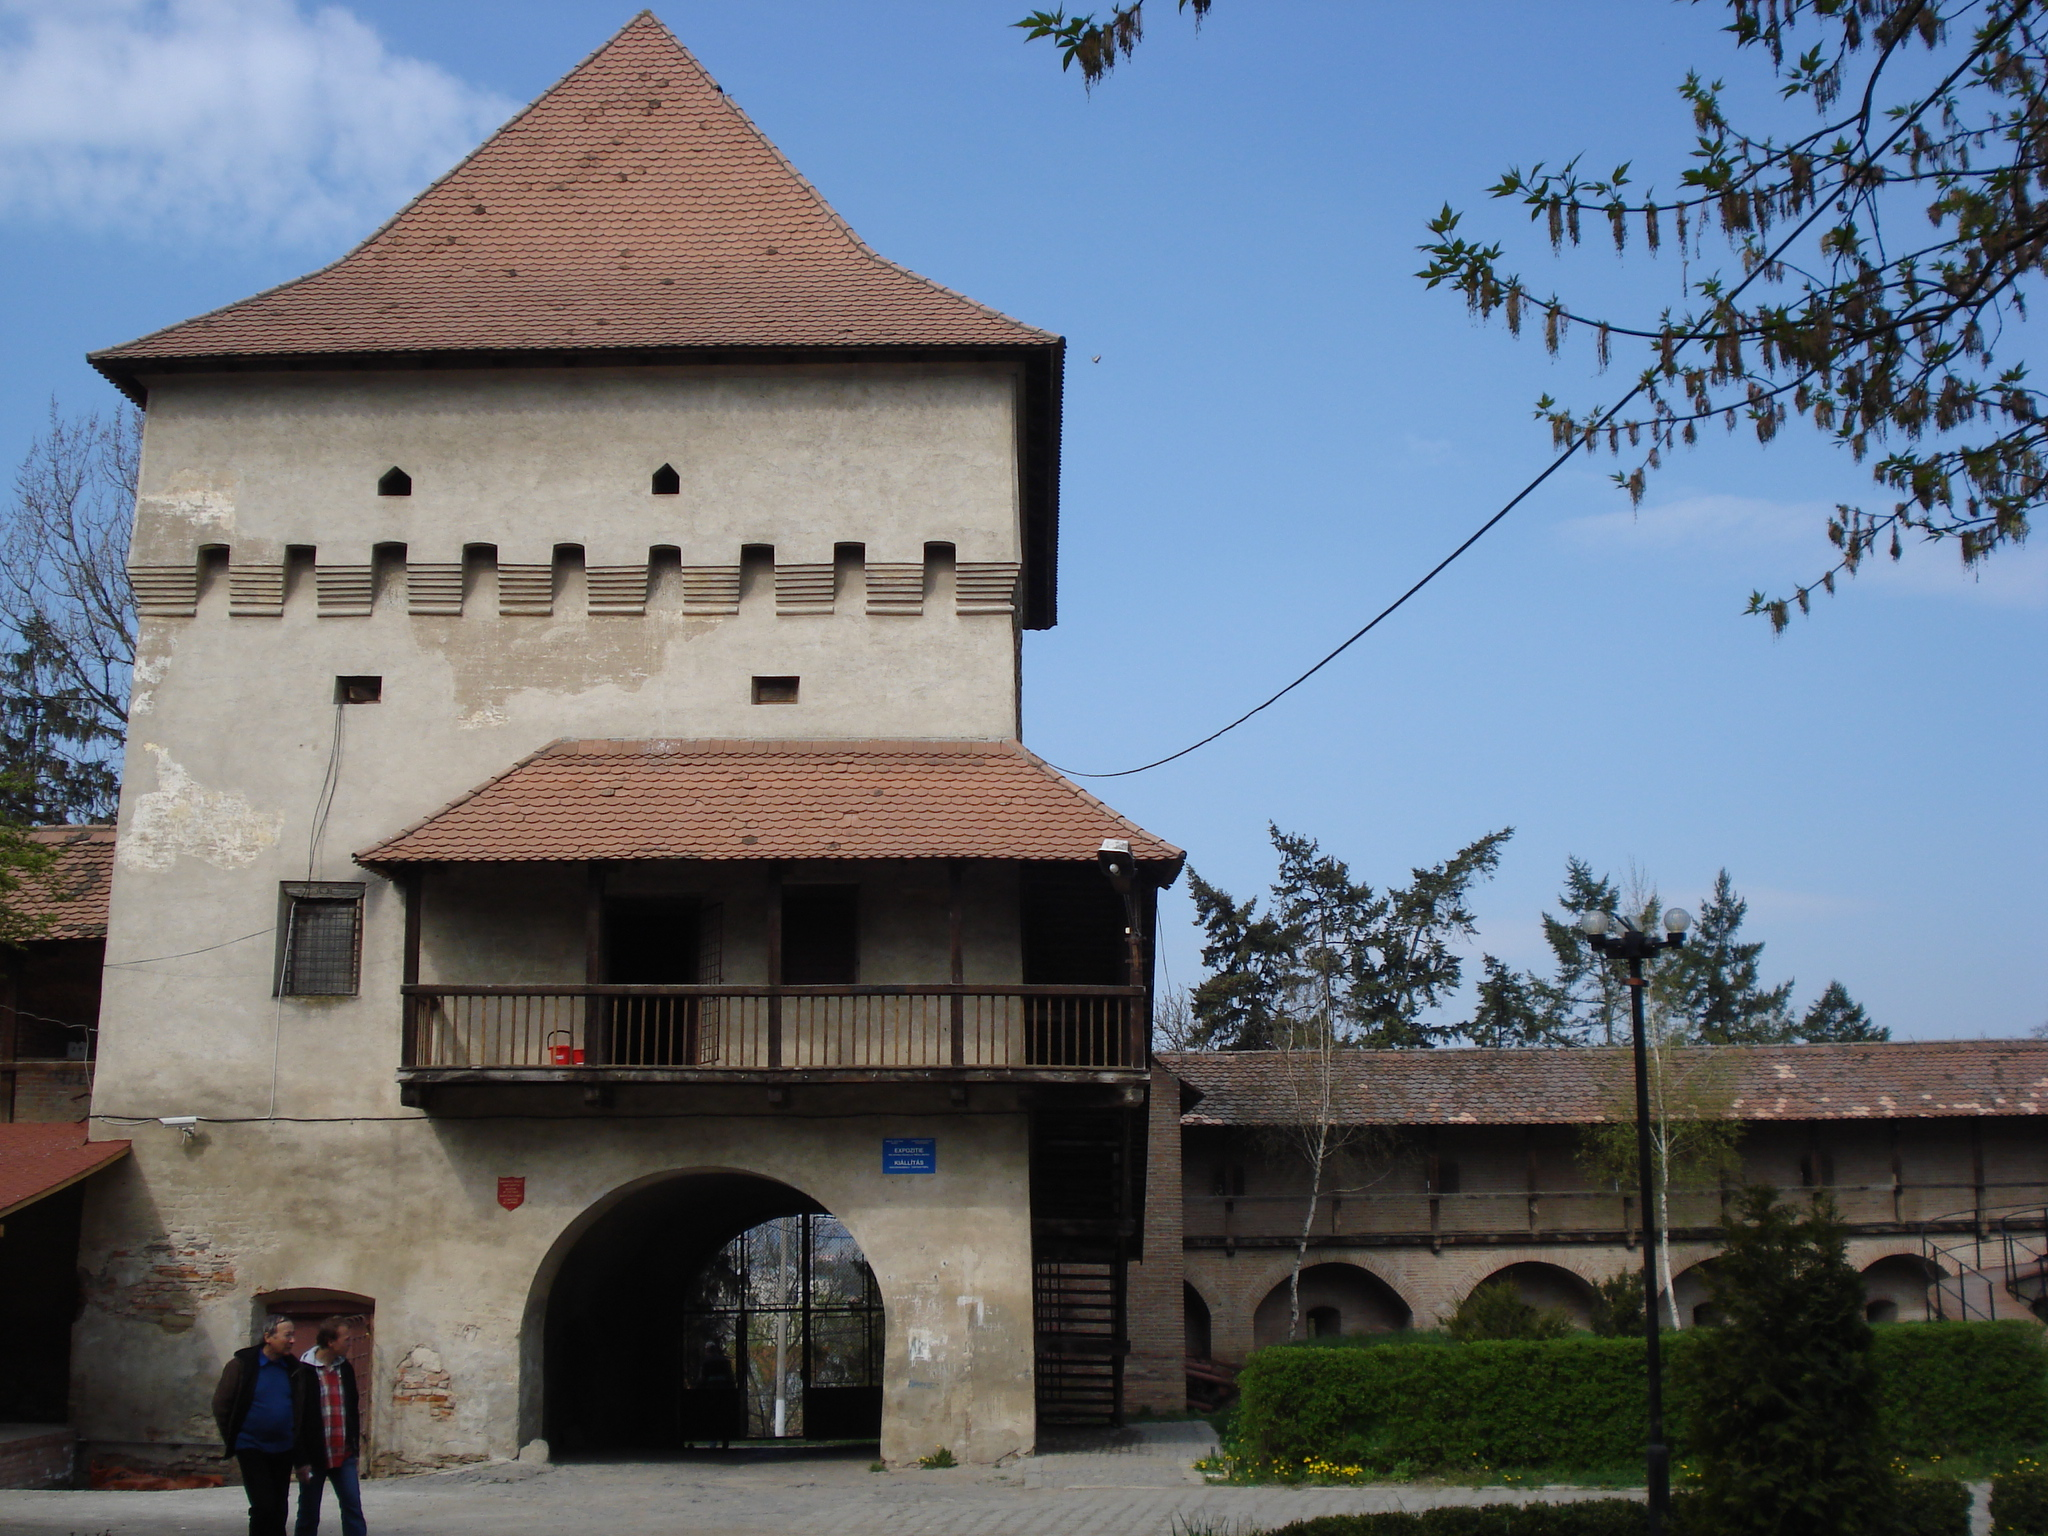 Complex Via ofera Cazare in Targu Mures, destinatie turistica din Transilvania